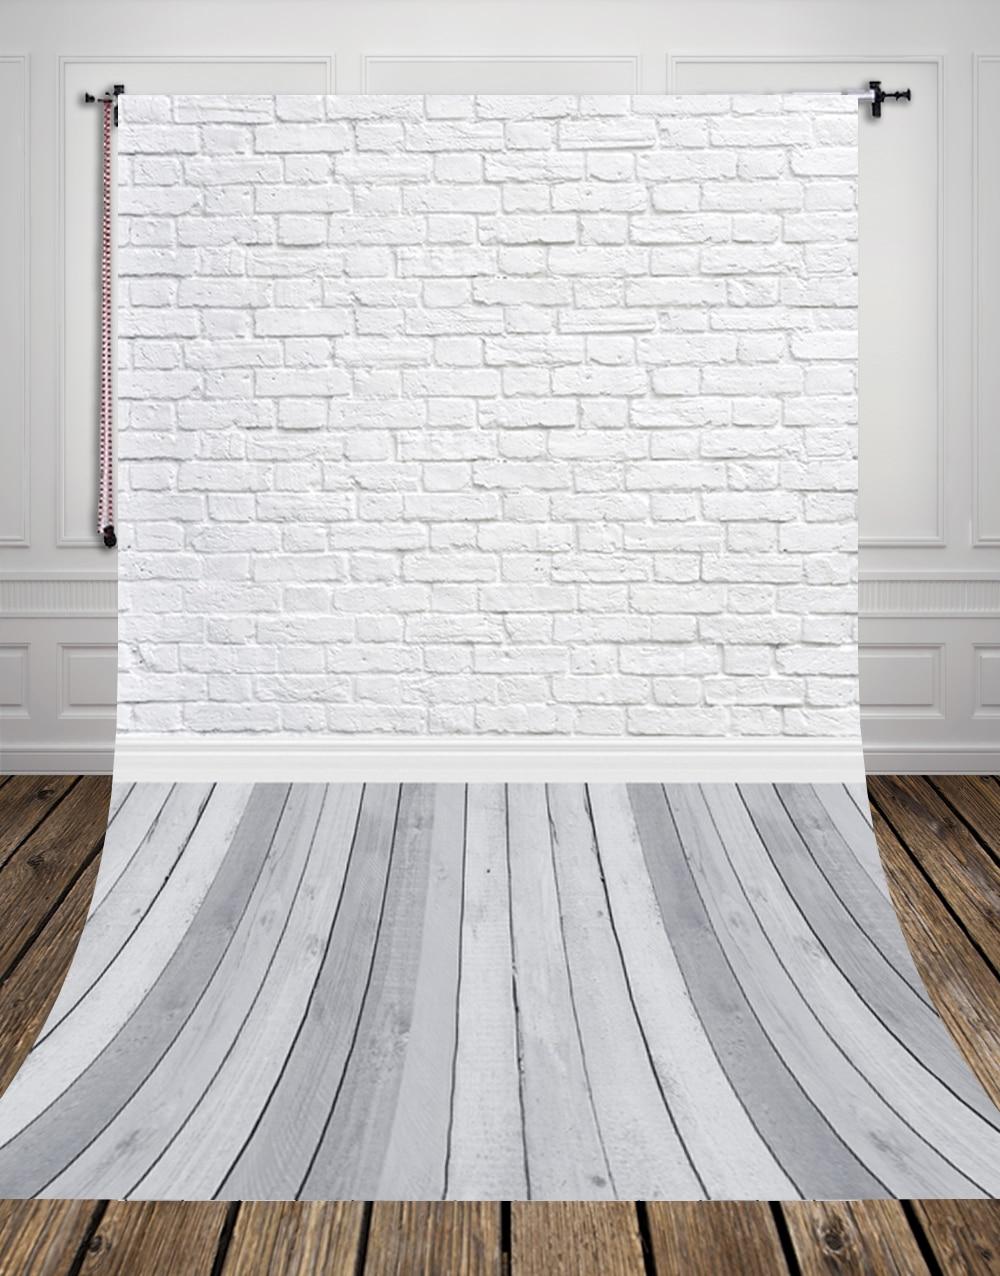 Grey Wood Floor Studio Photo Background Vinyl White Bricks Photography Backdrop for Pets Cakes Photos D-9713